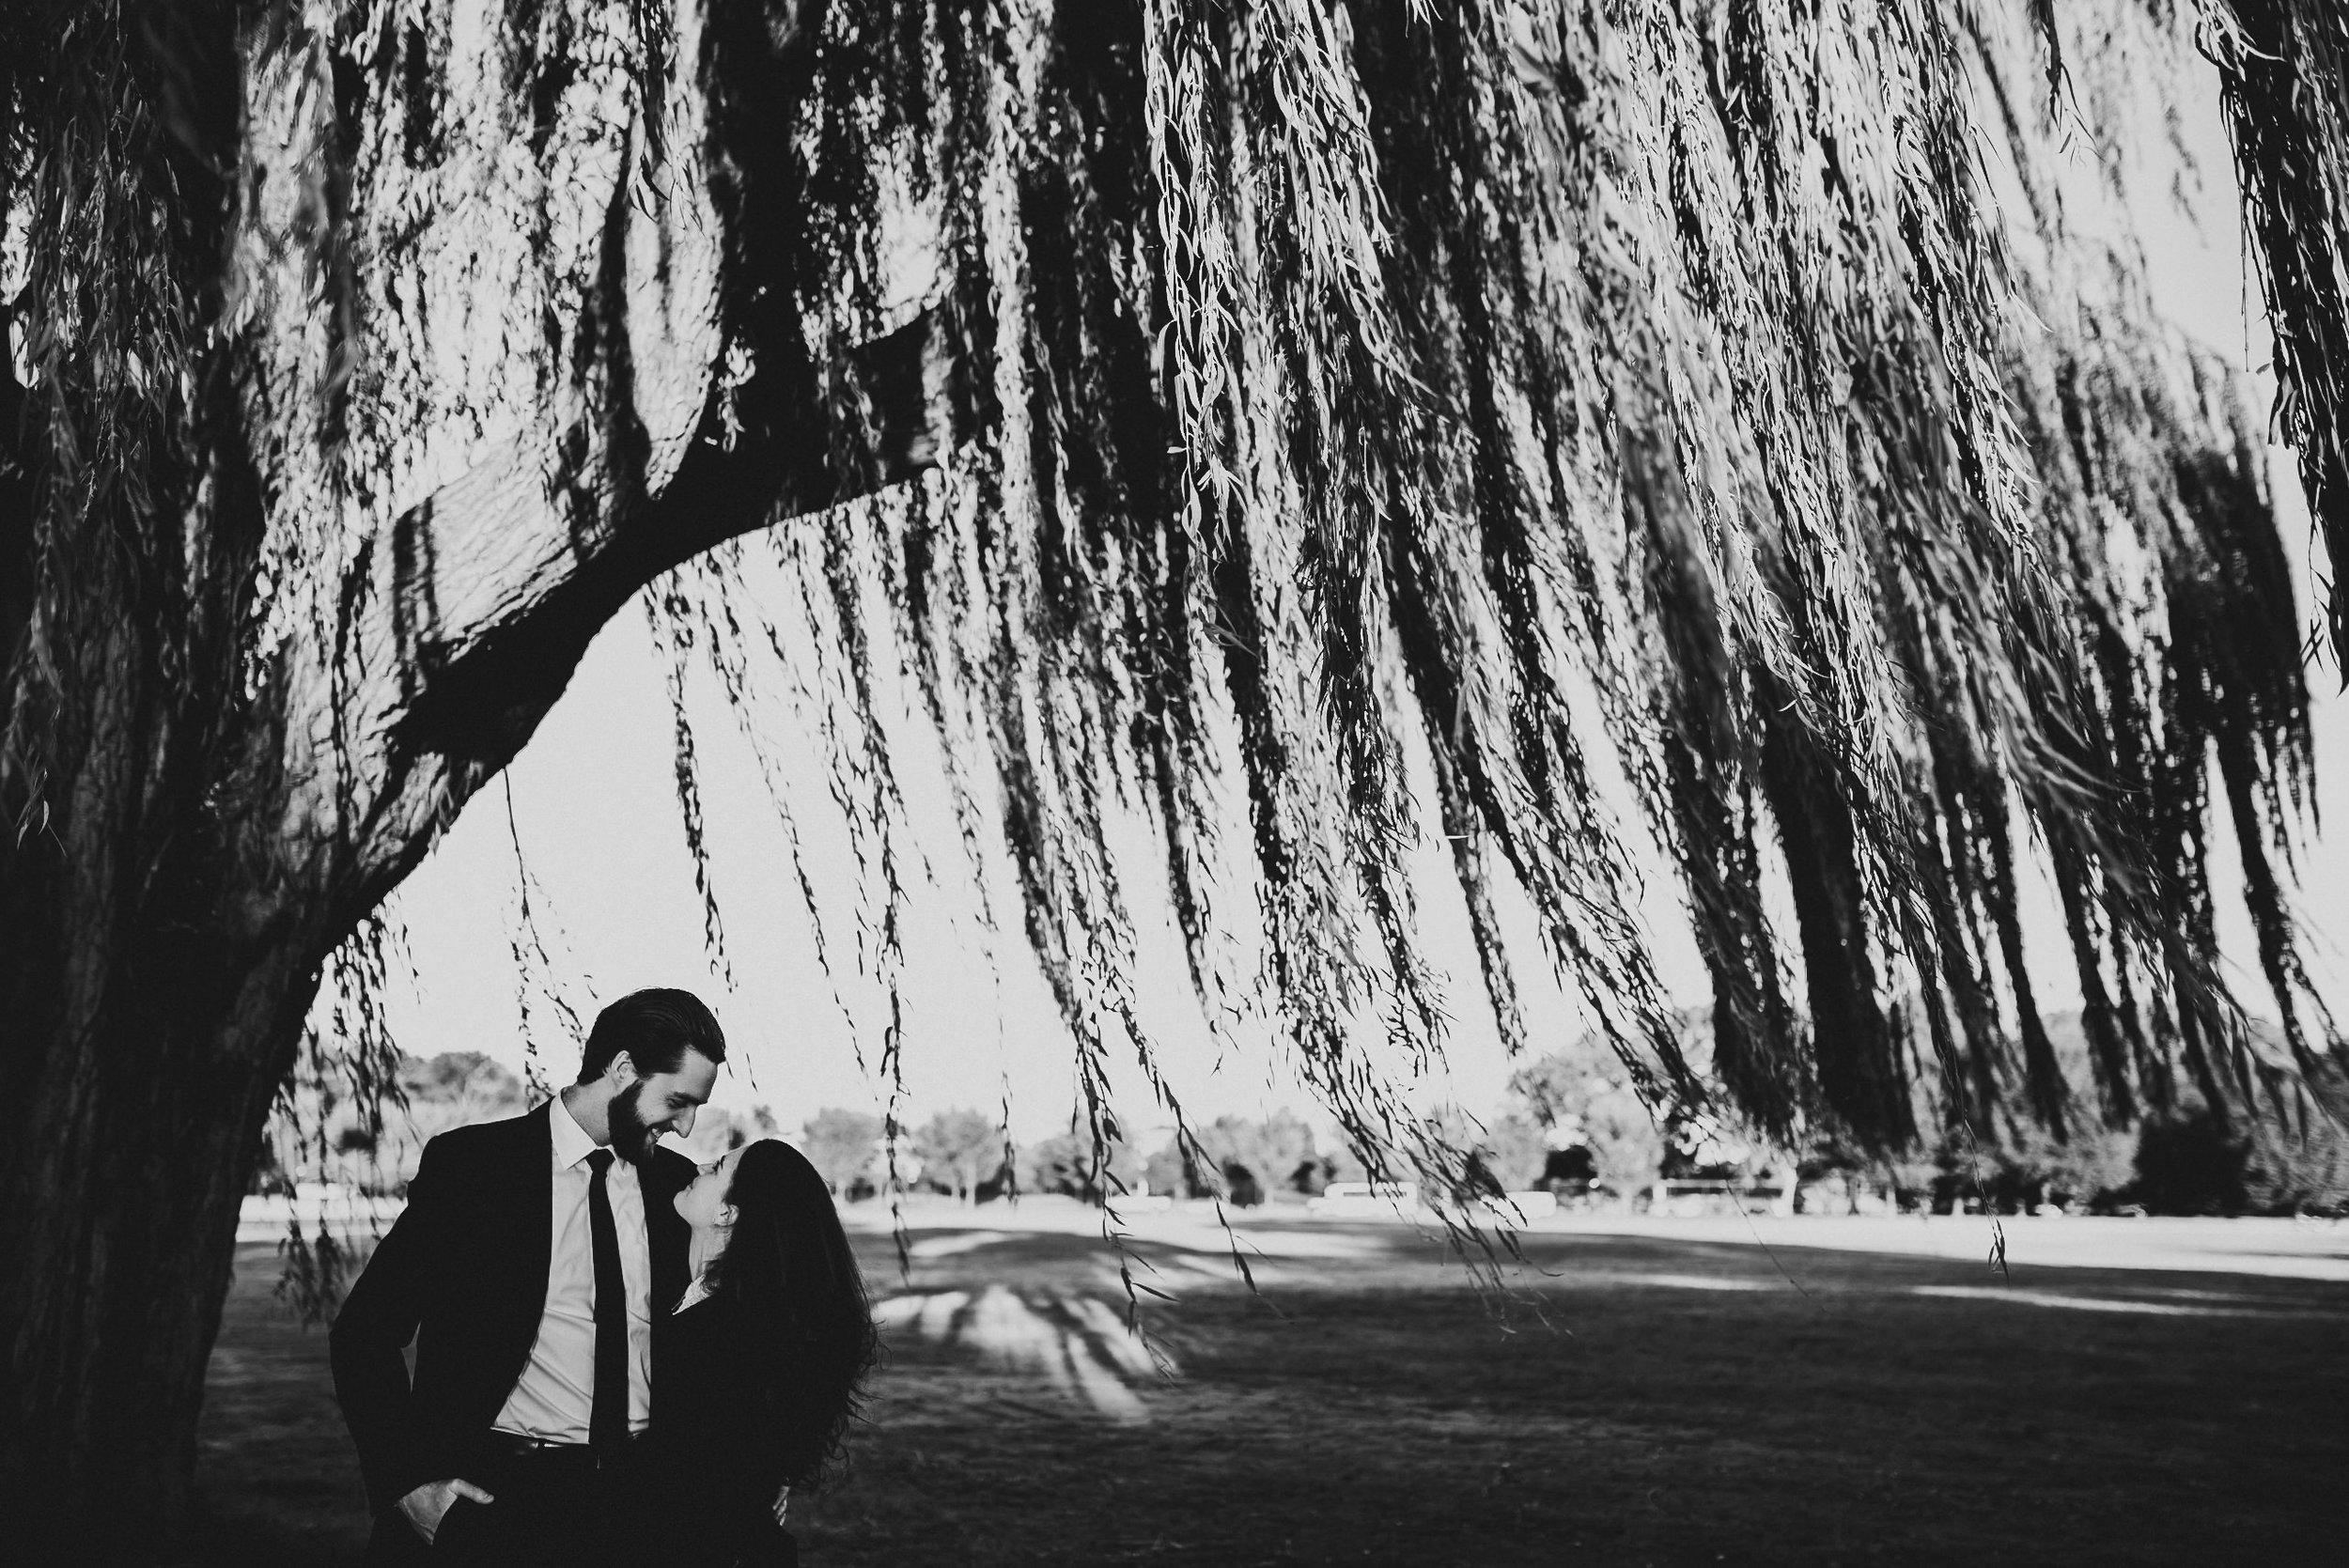 best engagement photographers washington dc Mantas Kubilinskas-13.jpg